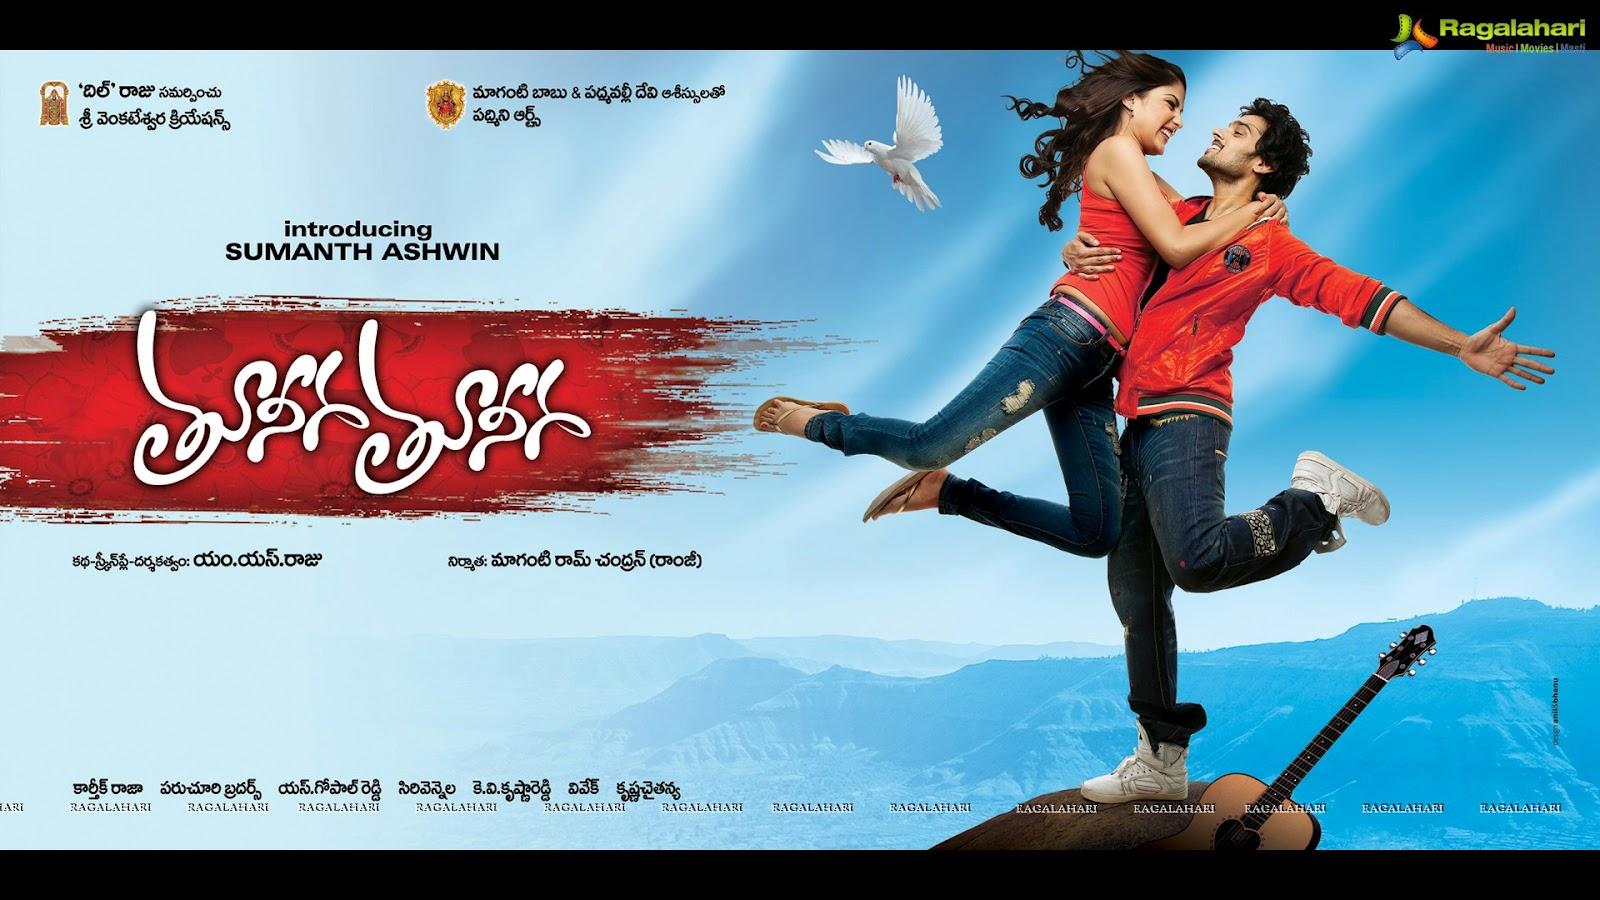 Prakhyat--lavu: tuneega tuneega (2012) mp3 songs free download.